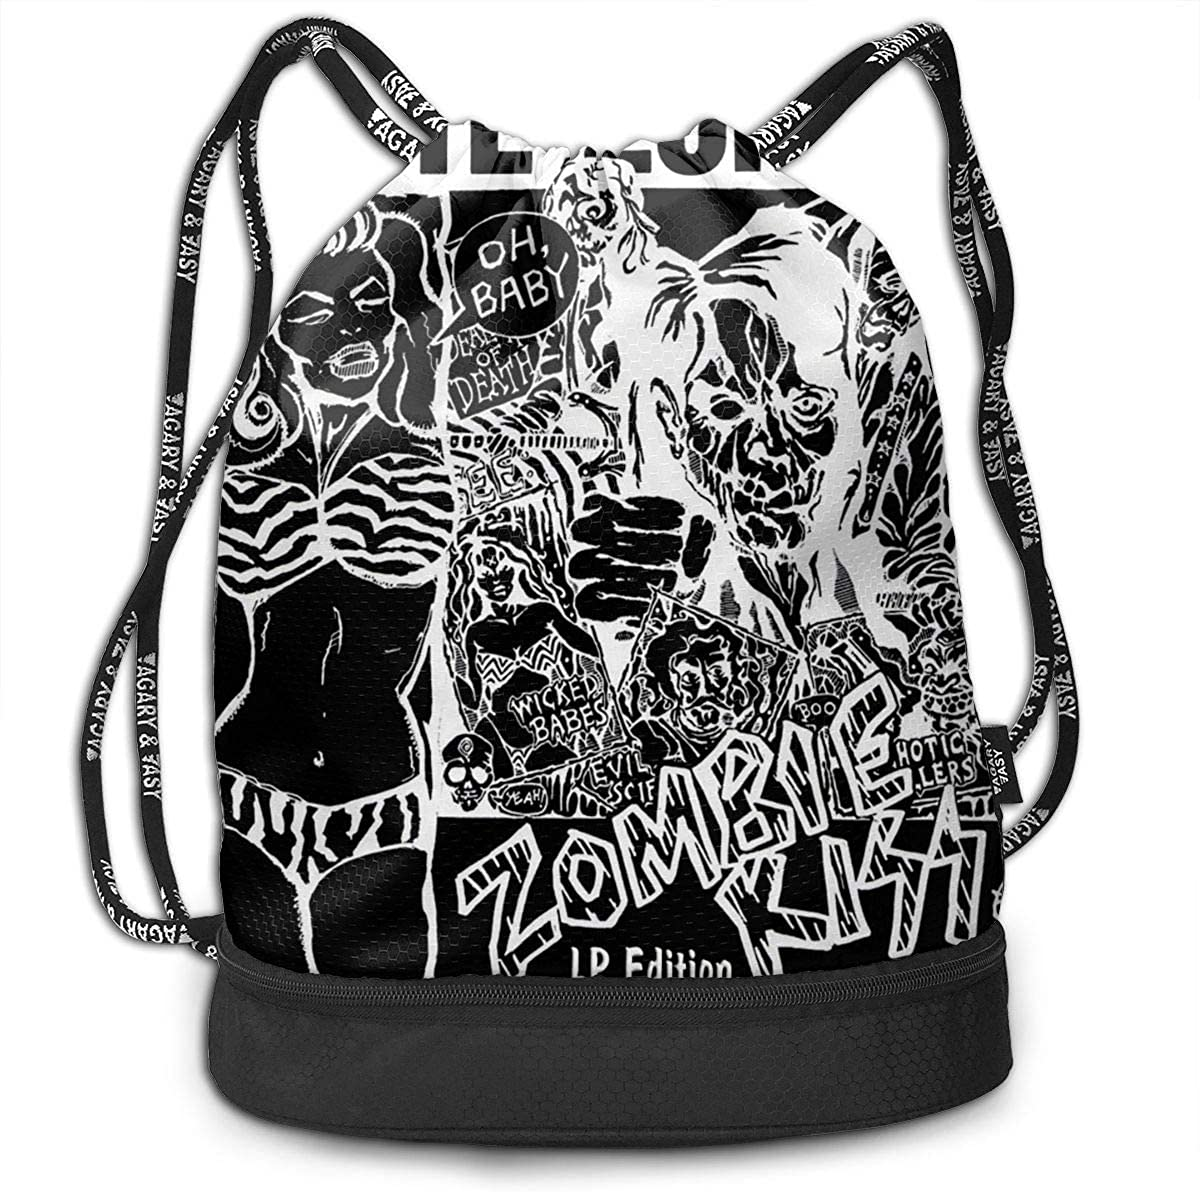 AgoodShop White Zombie Drawstring Backpack Sport Gym Travel Bag